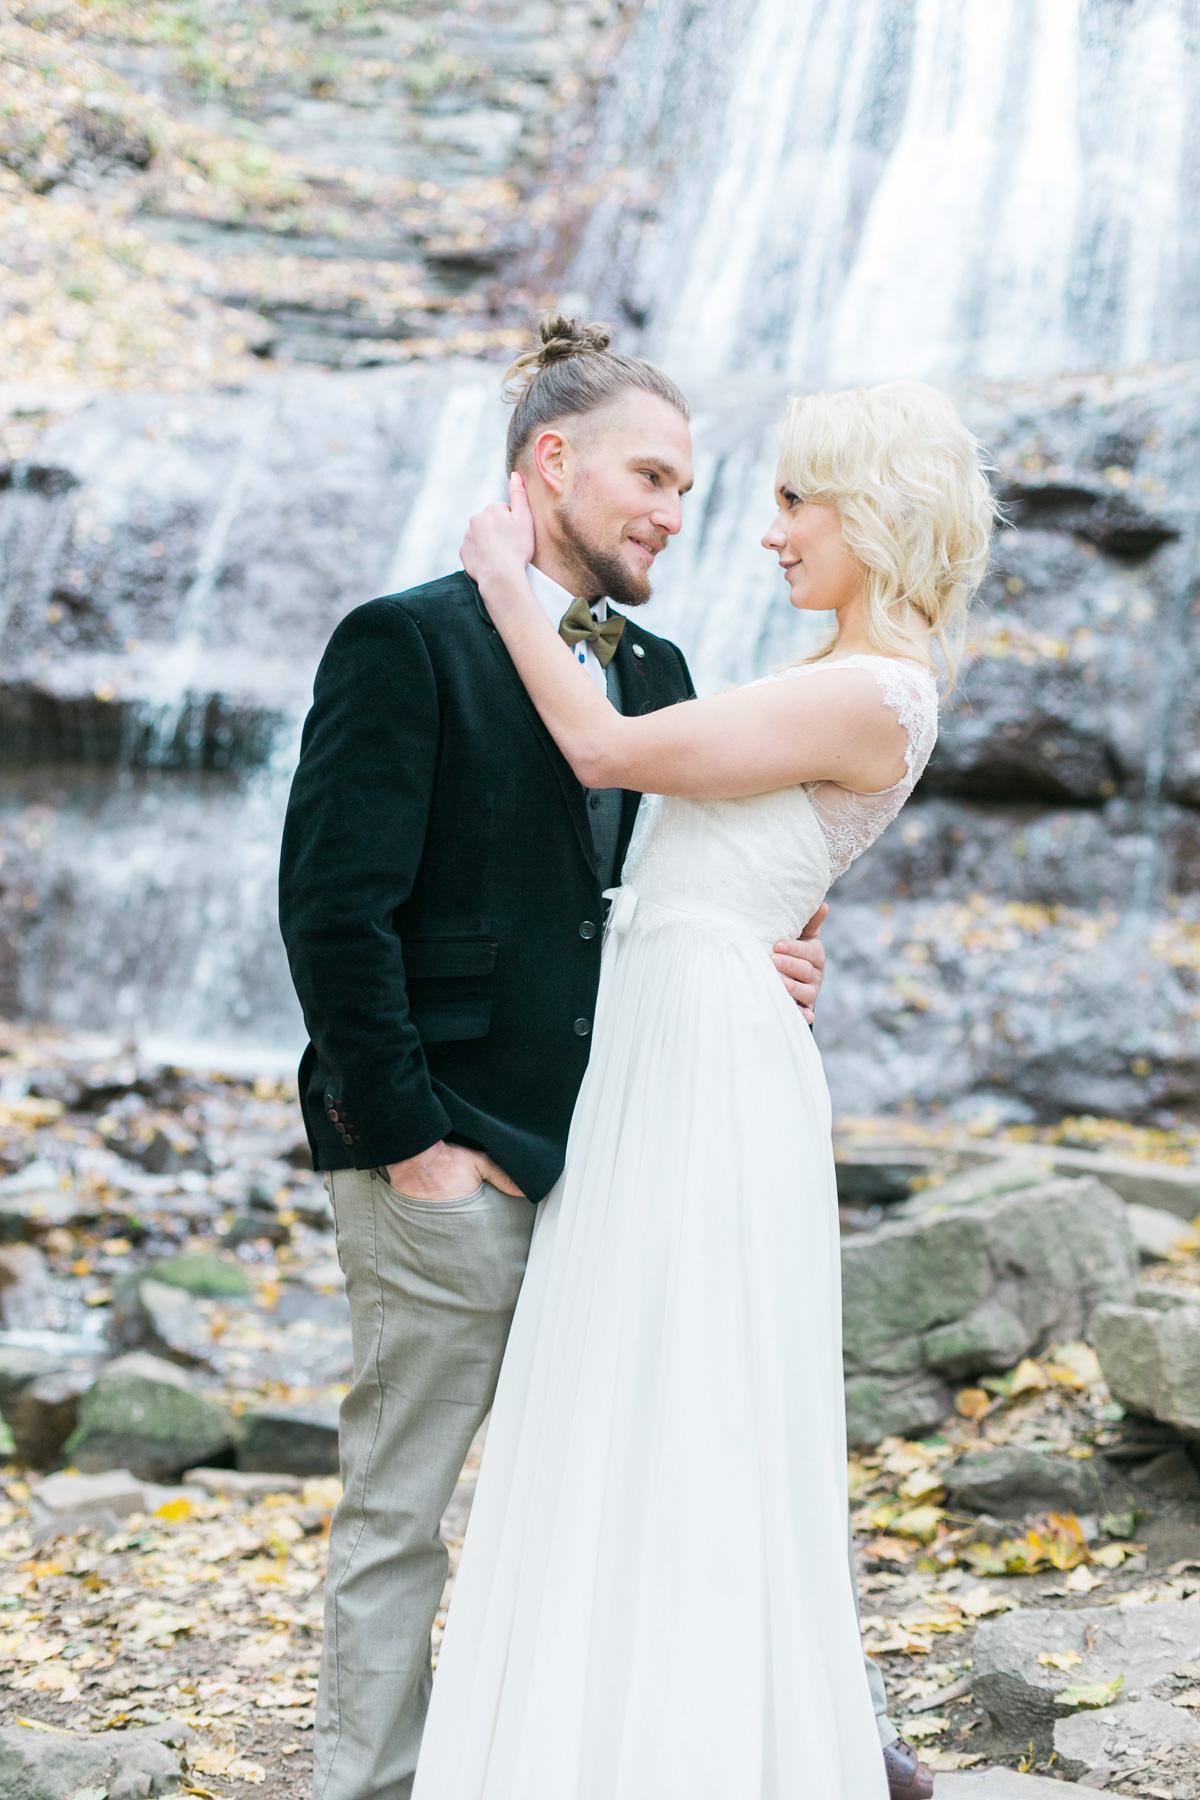 melissa-northcott-photography-vineyard-bride-swish-list-hamilton-waterfall-editorial-14.jpg